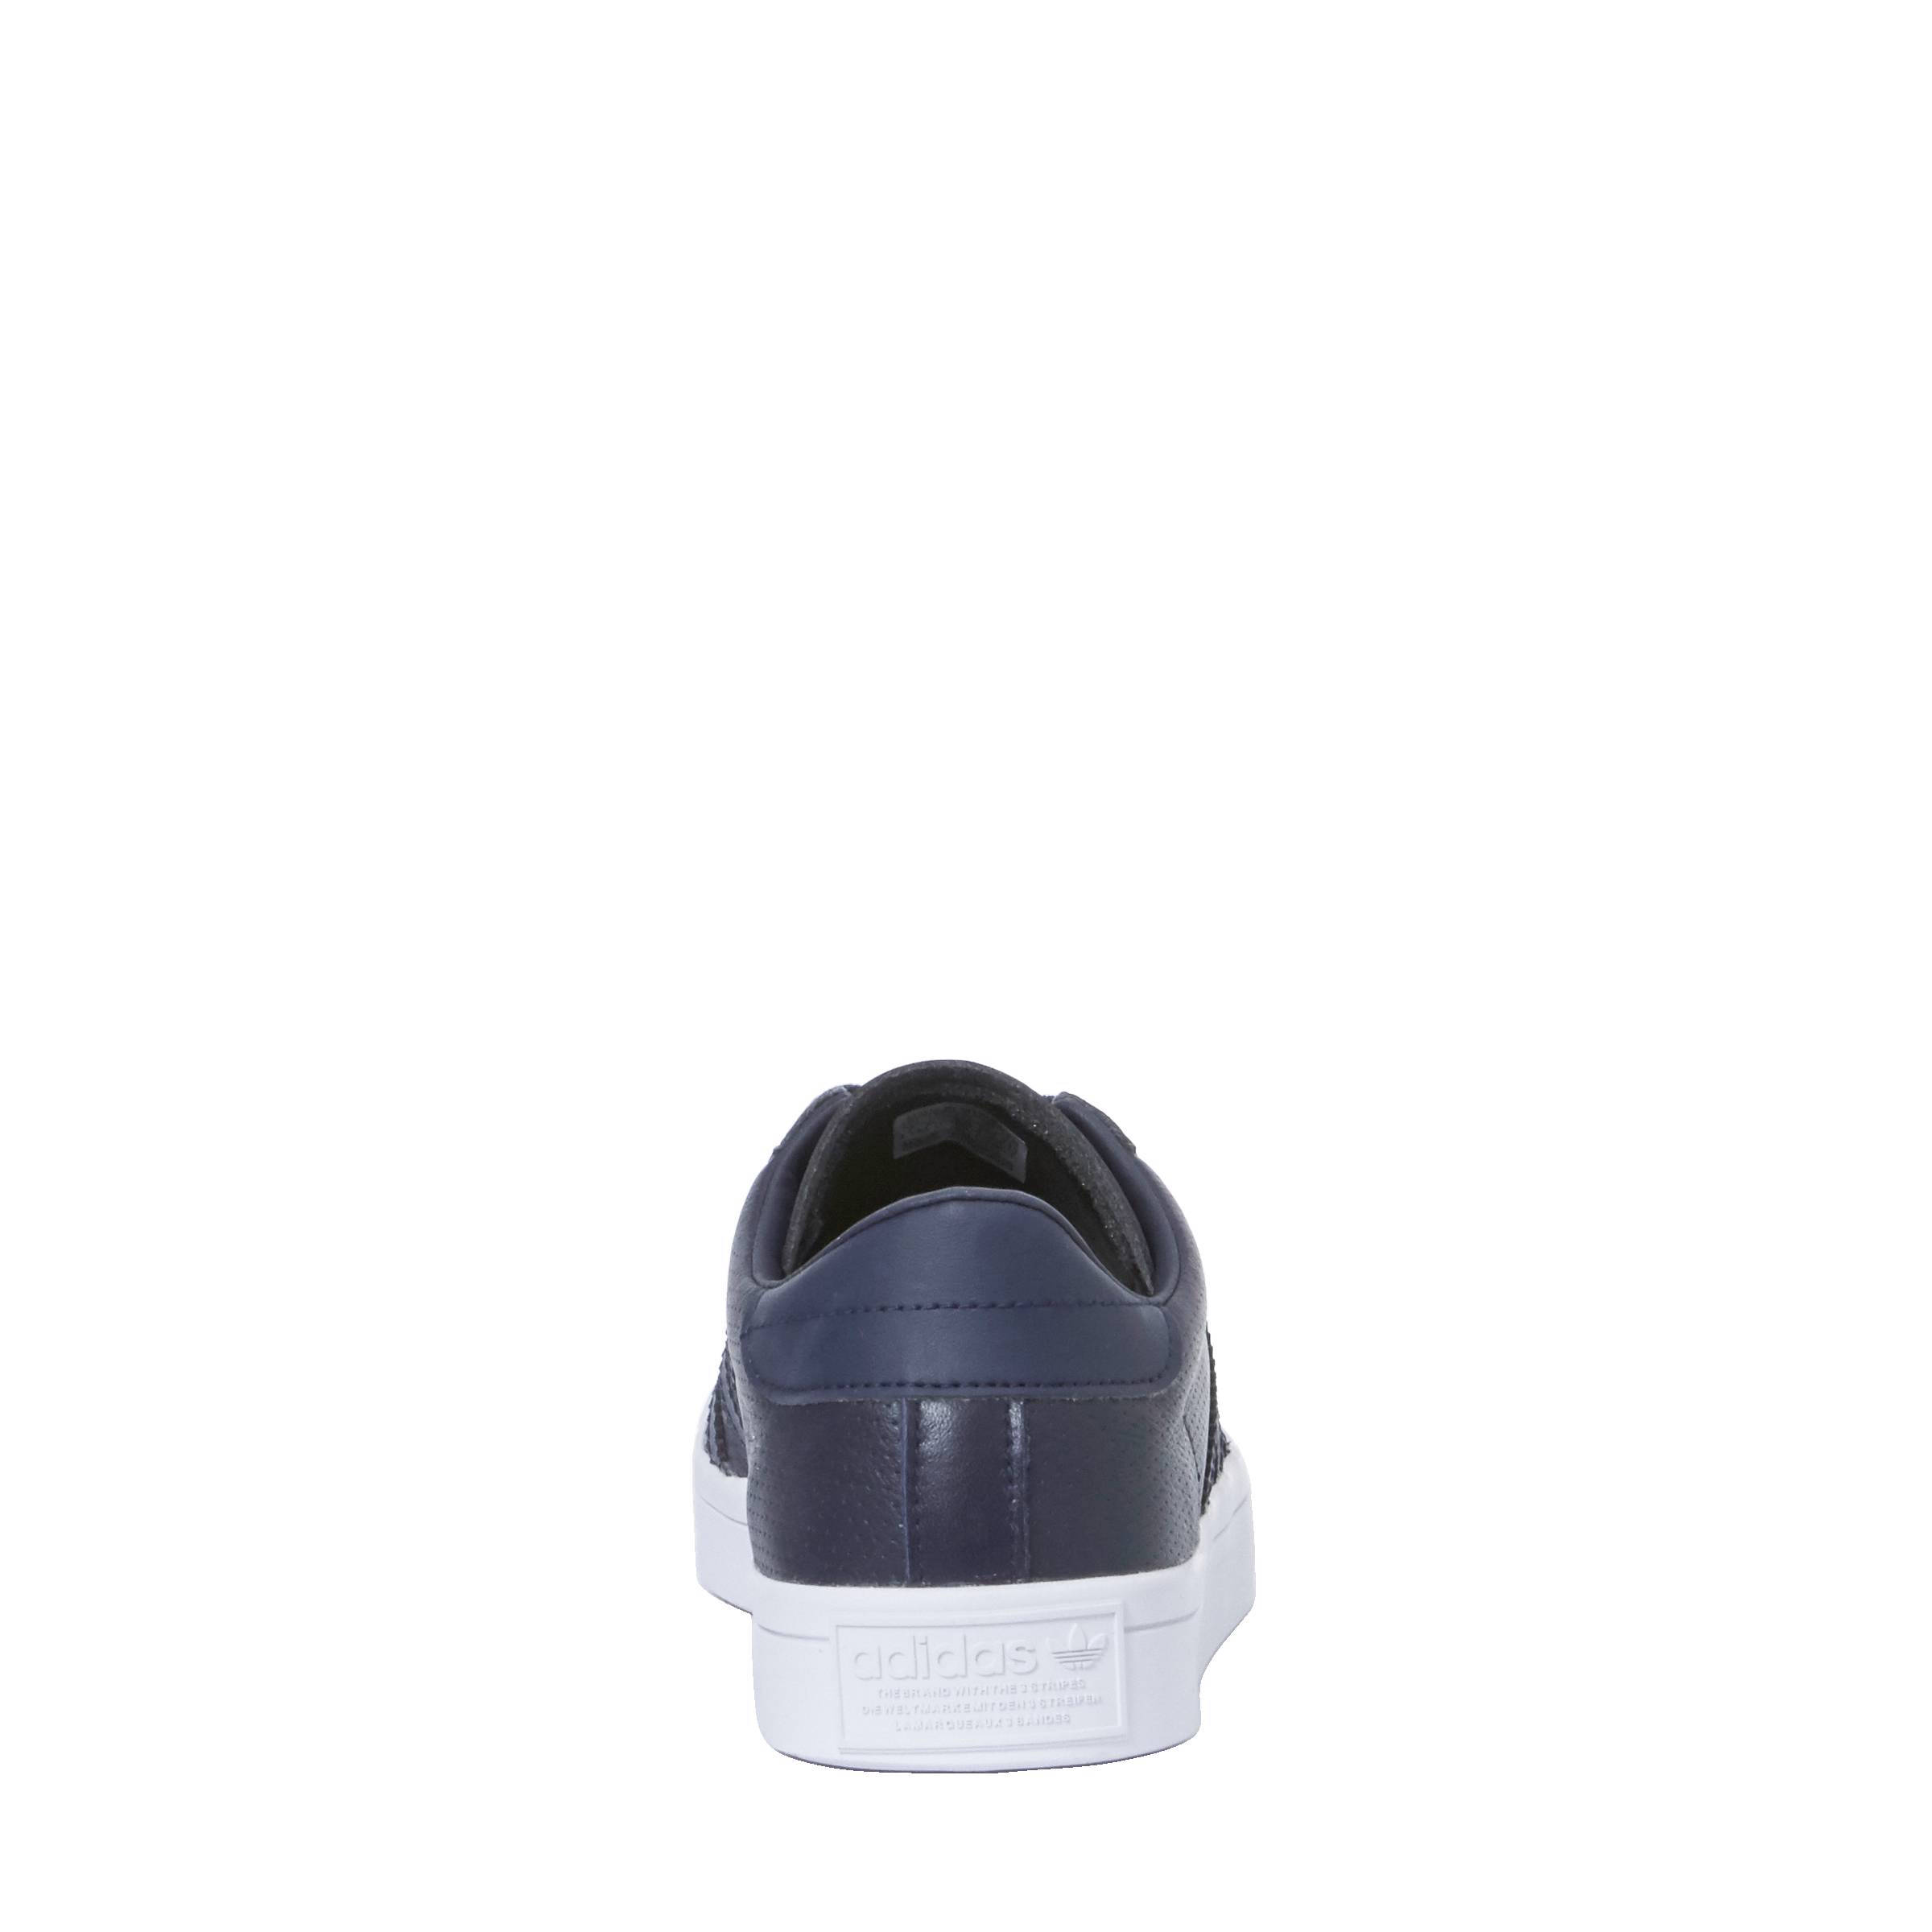 sports shoes cbc45 88b45 adidas originals Courtvantage sneakers  wehkamp